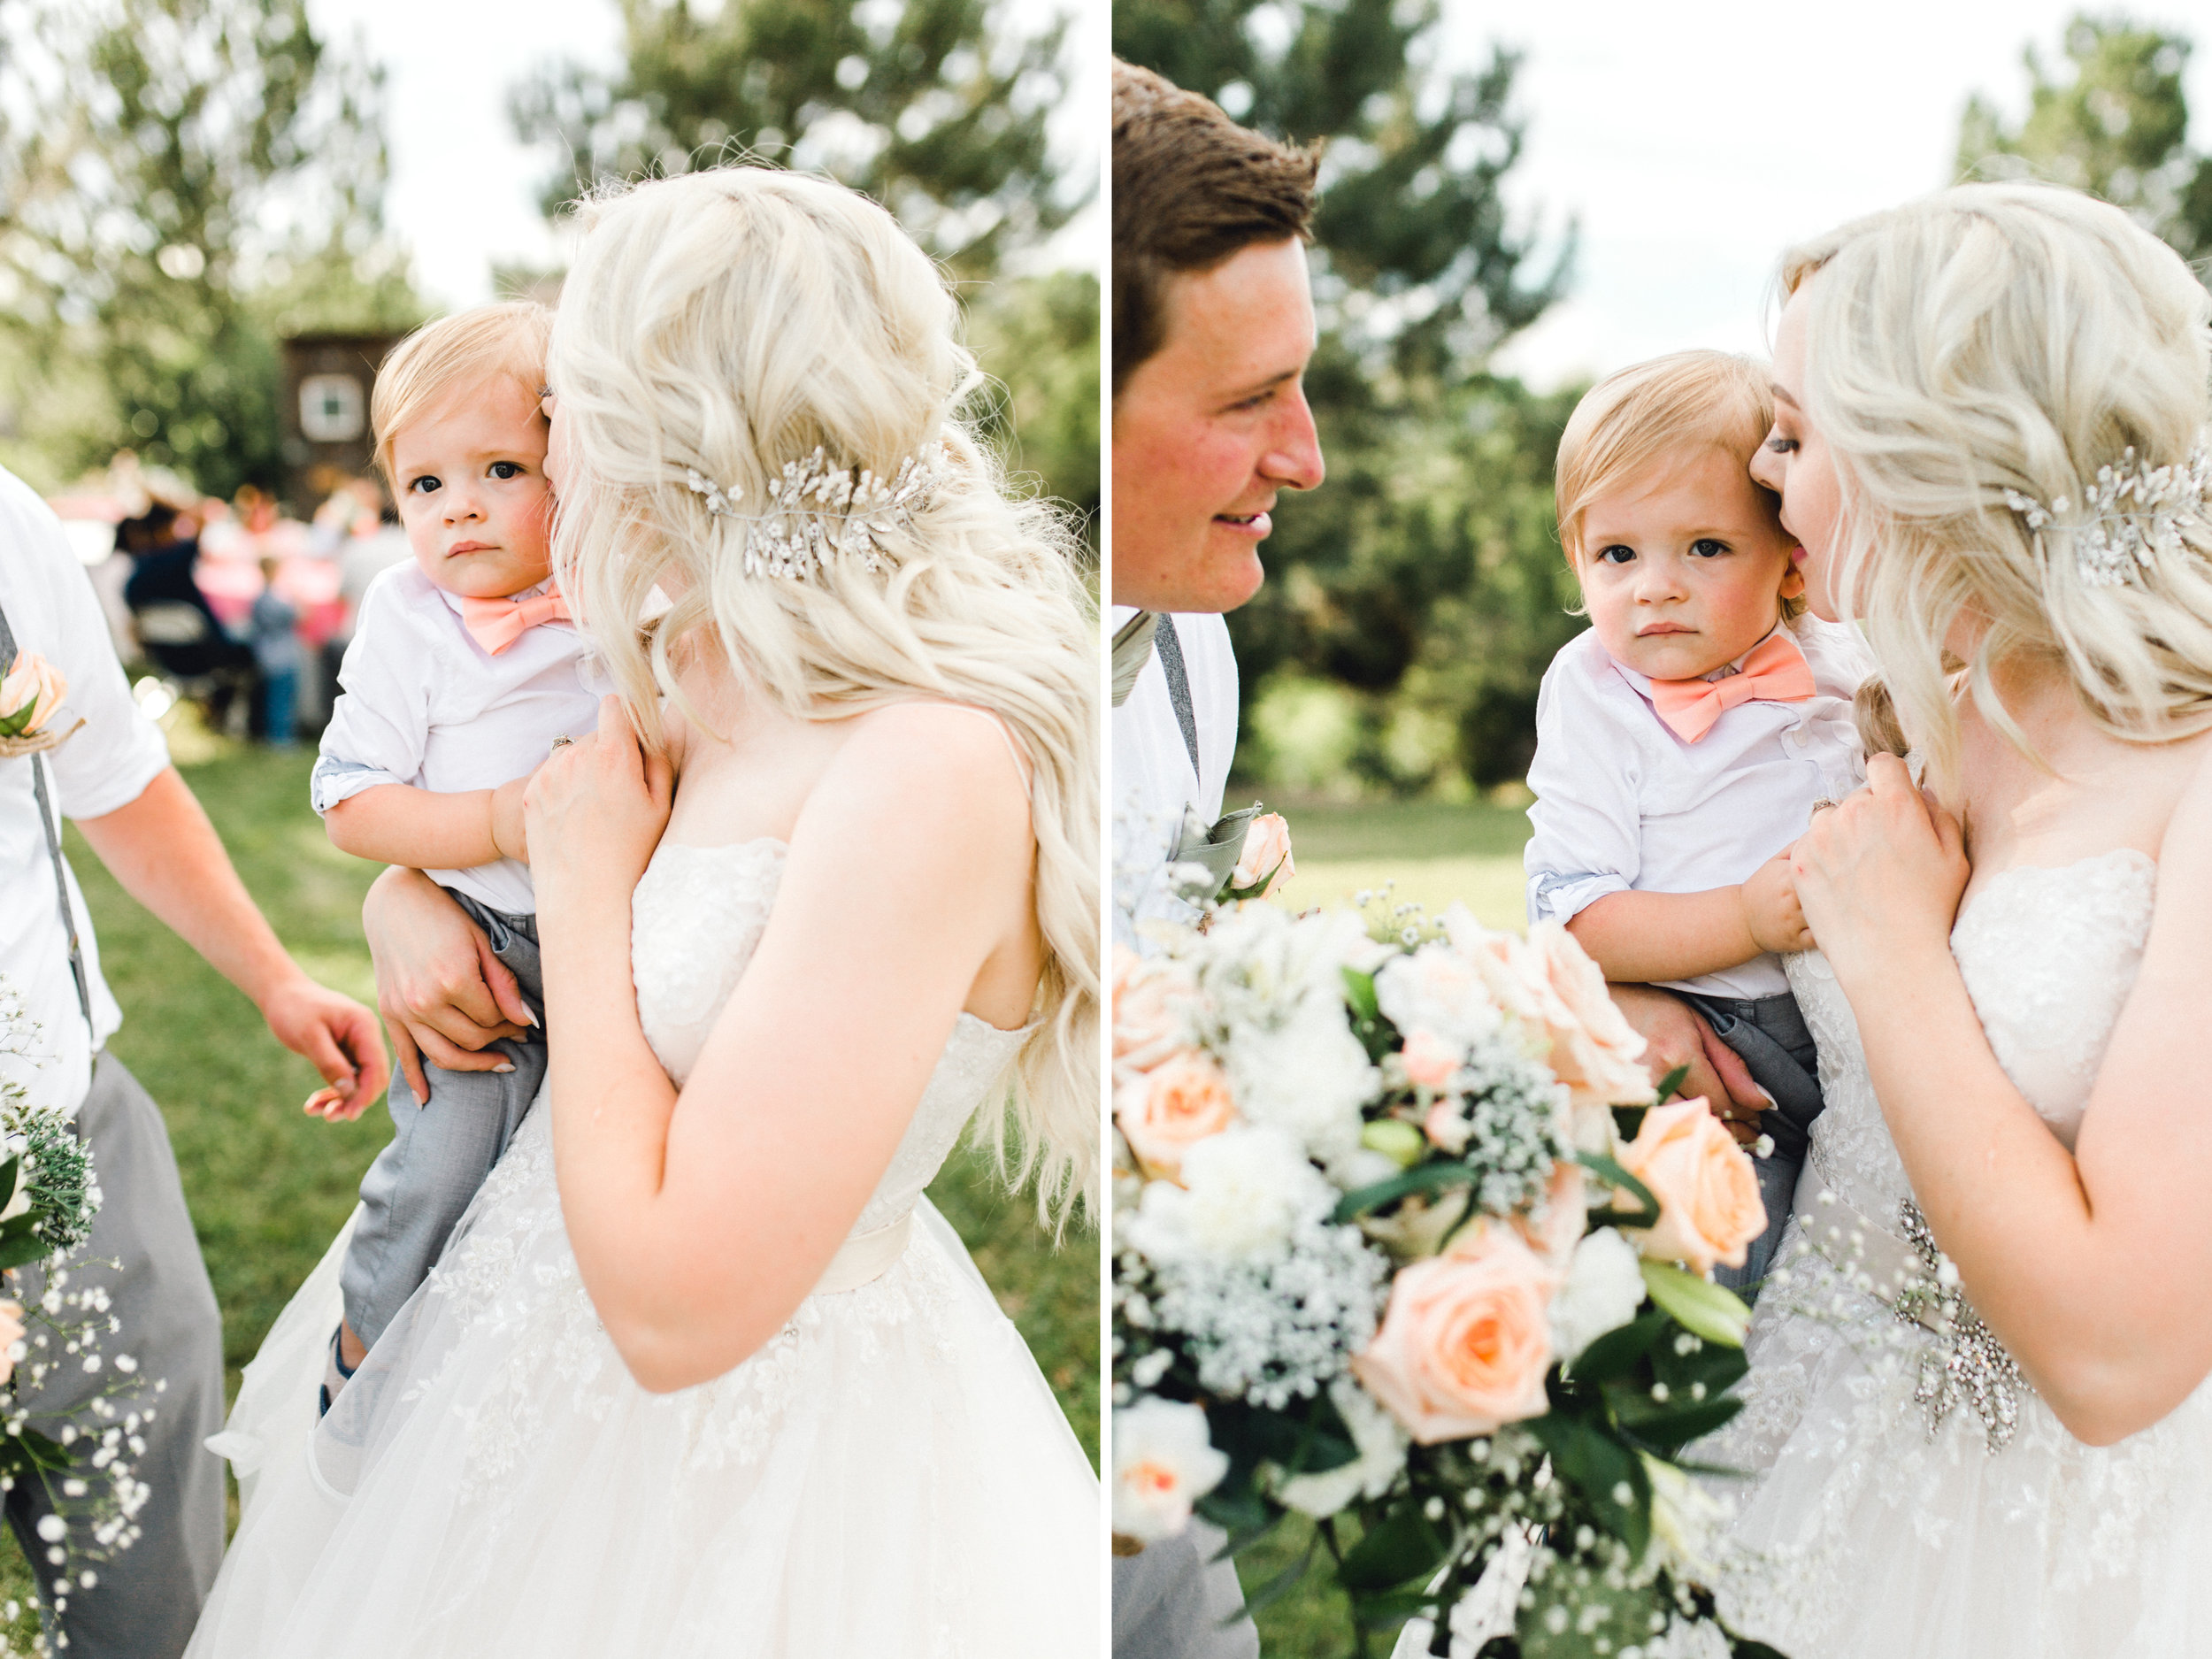 country-outdoor-rustic-wedding-tetons-idaho-anna-christine-photo-2.jpg